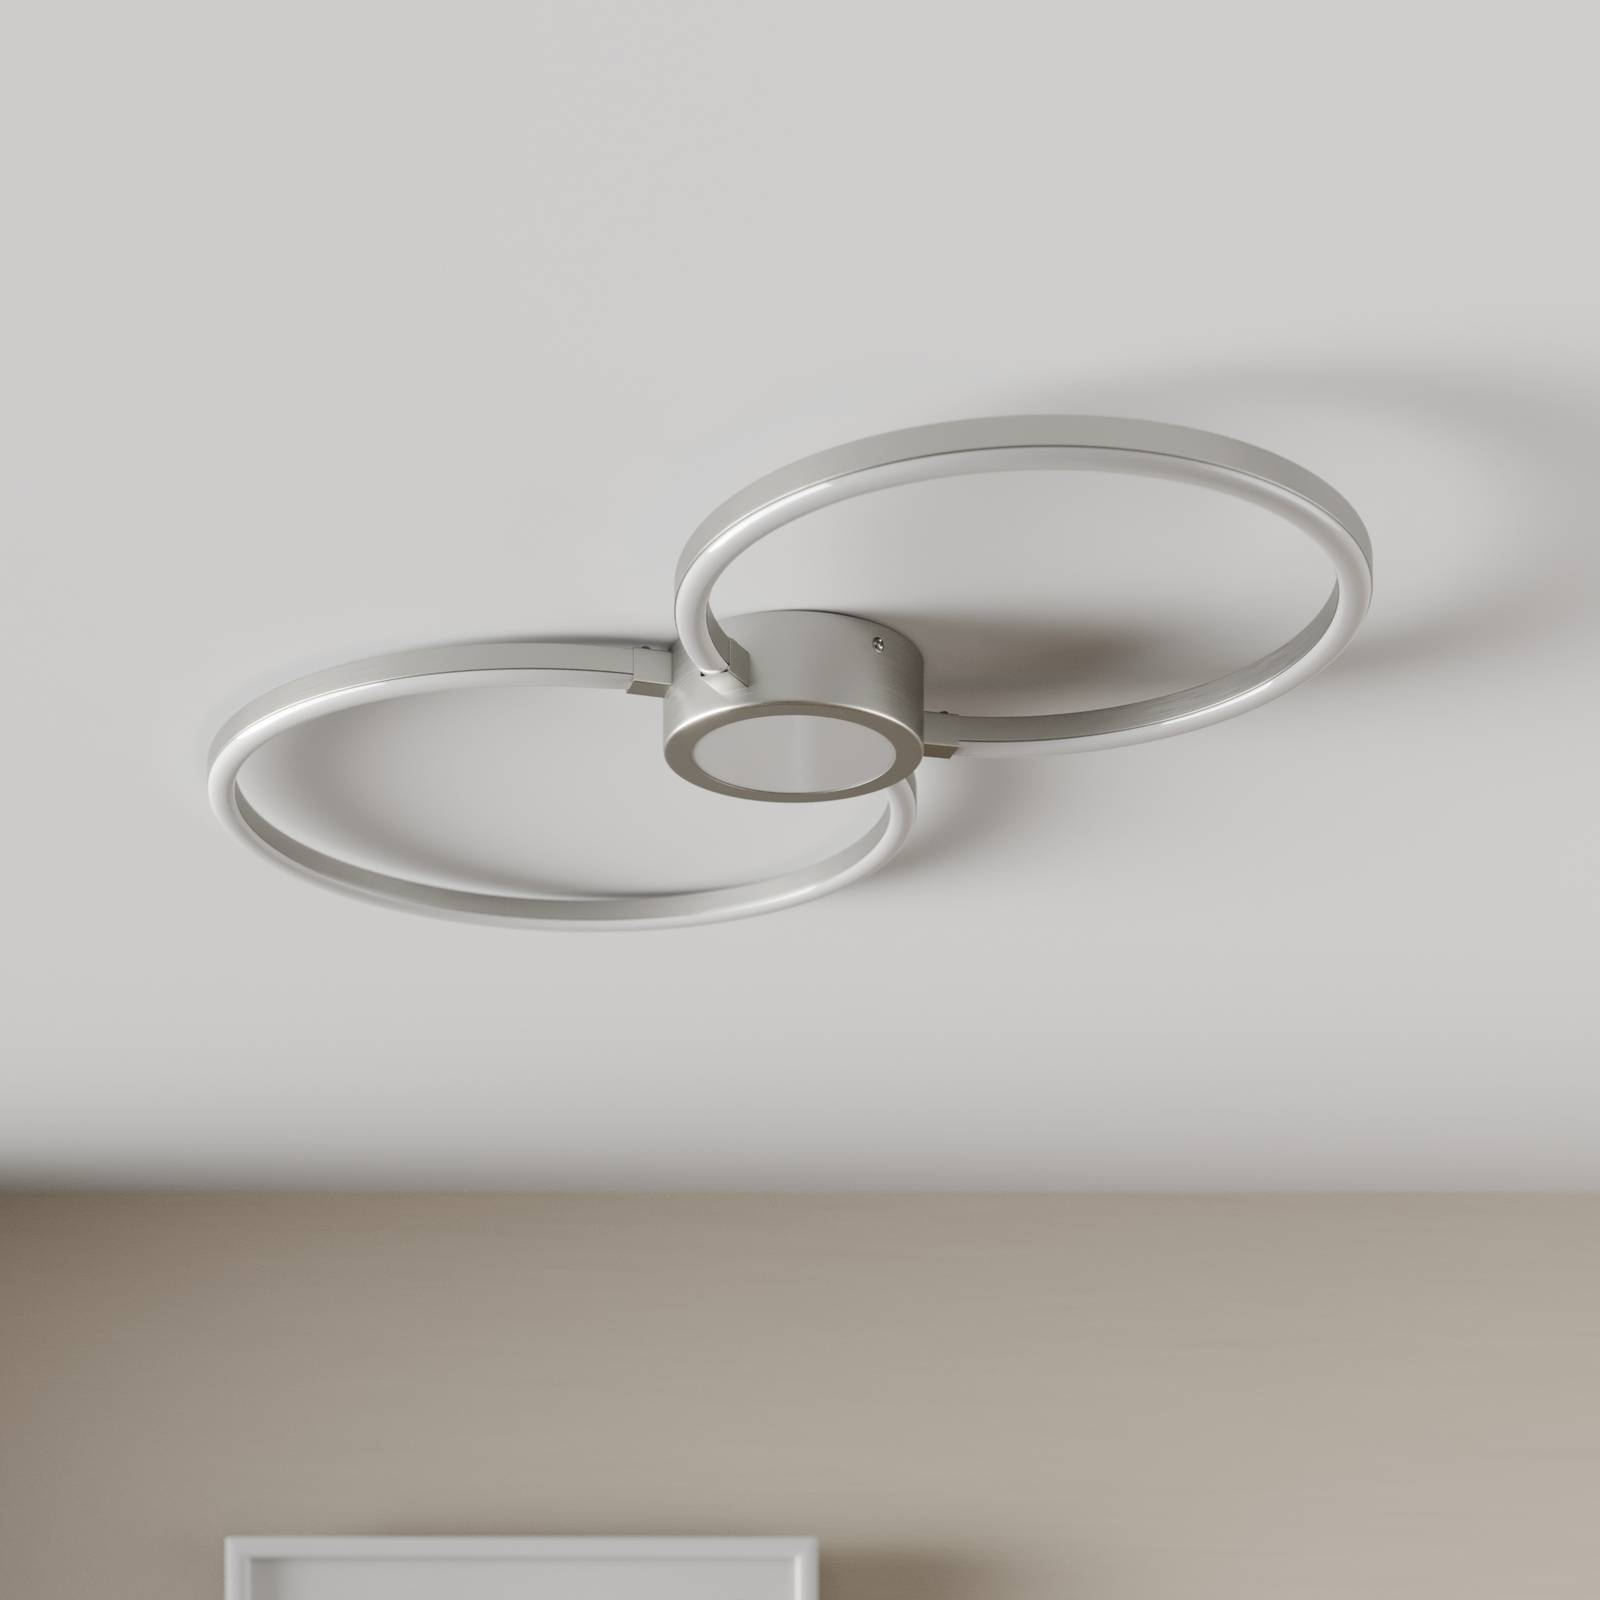 LED plafondlamp Duetto, rondjes